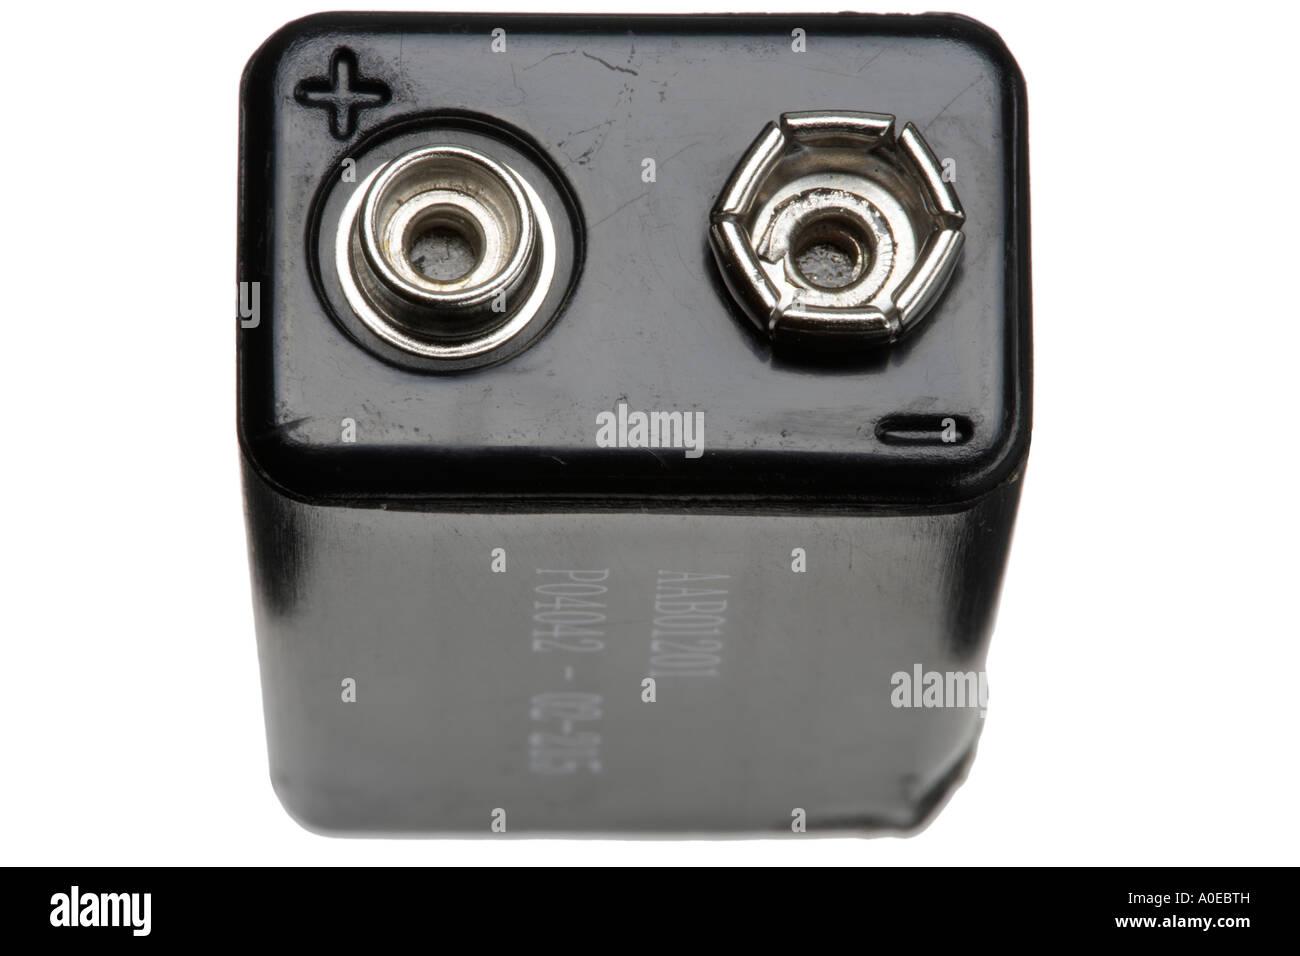 9 volt battery terminals Stock Photo: 9970192 - Alamy